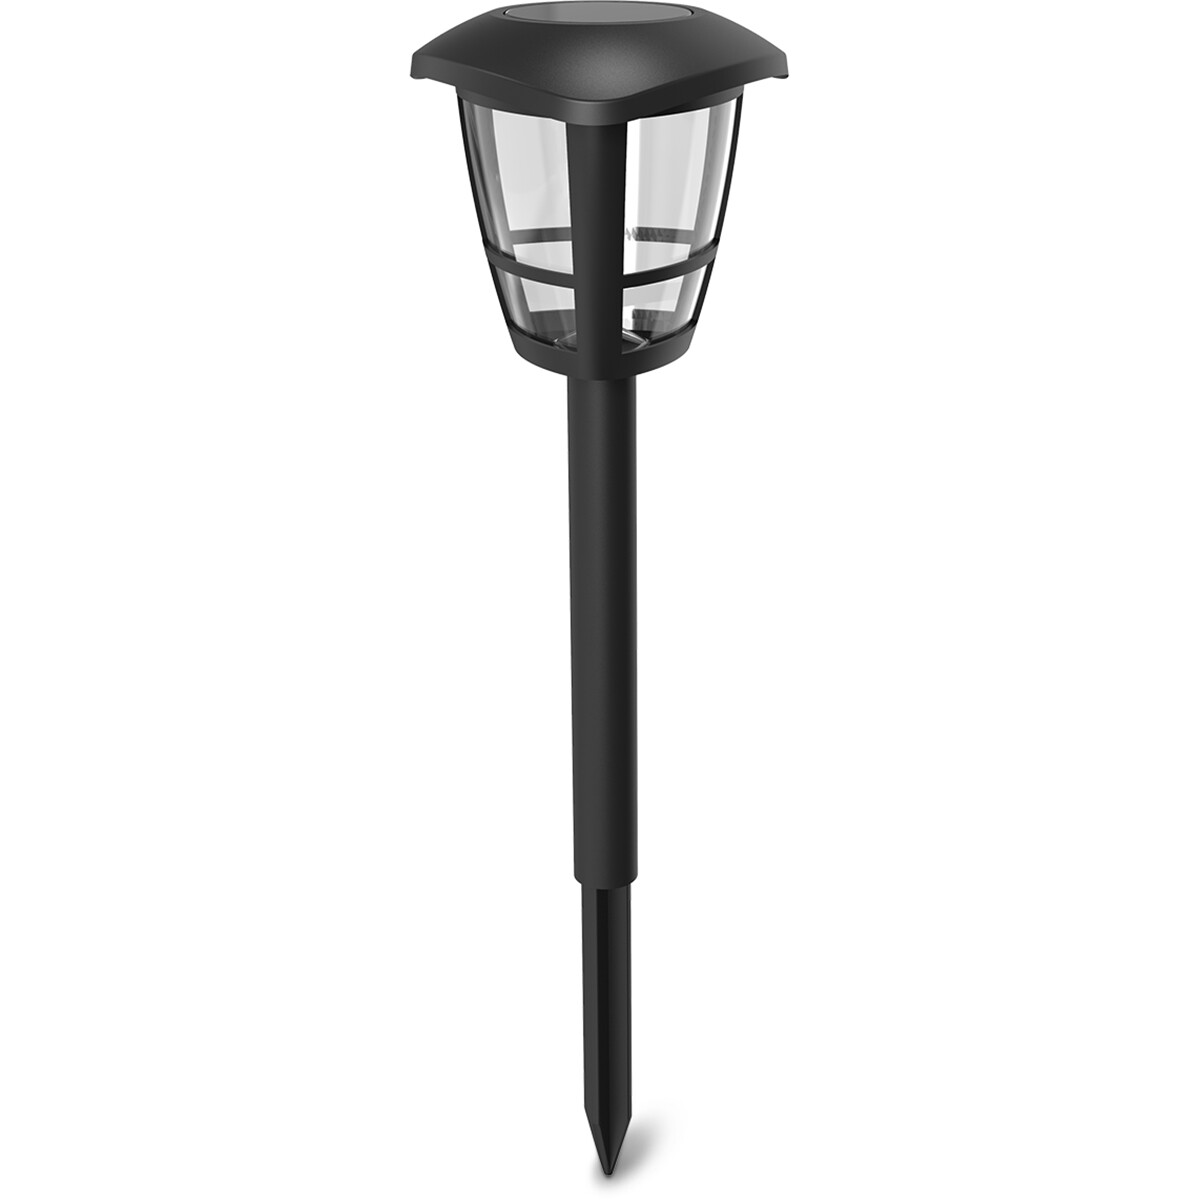 LED Priklamp met Zonne-energie - Aigi Nina - 0.06W - Helder/Koud Wit 6500K - Mat Zwart - Kunststof